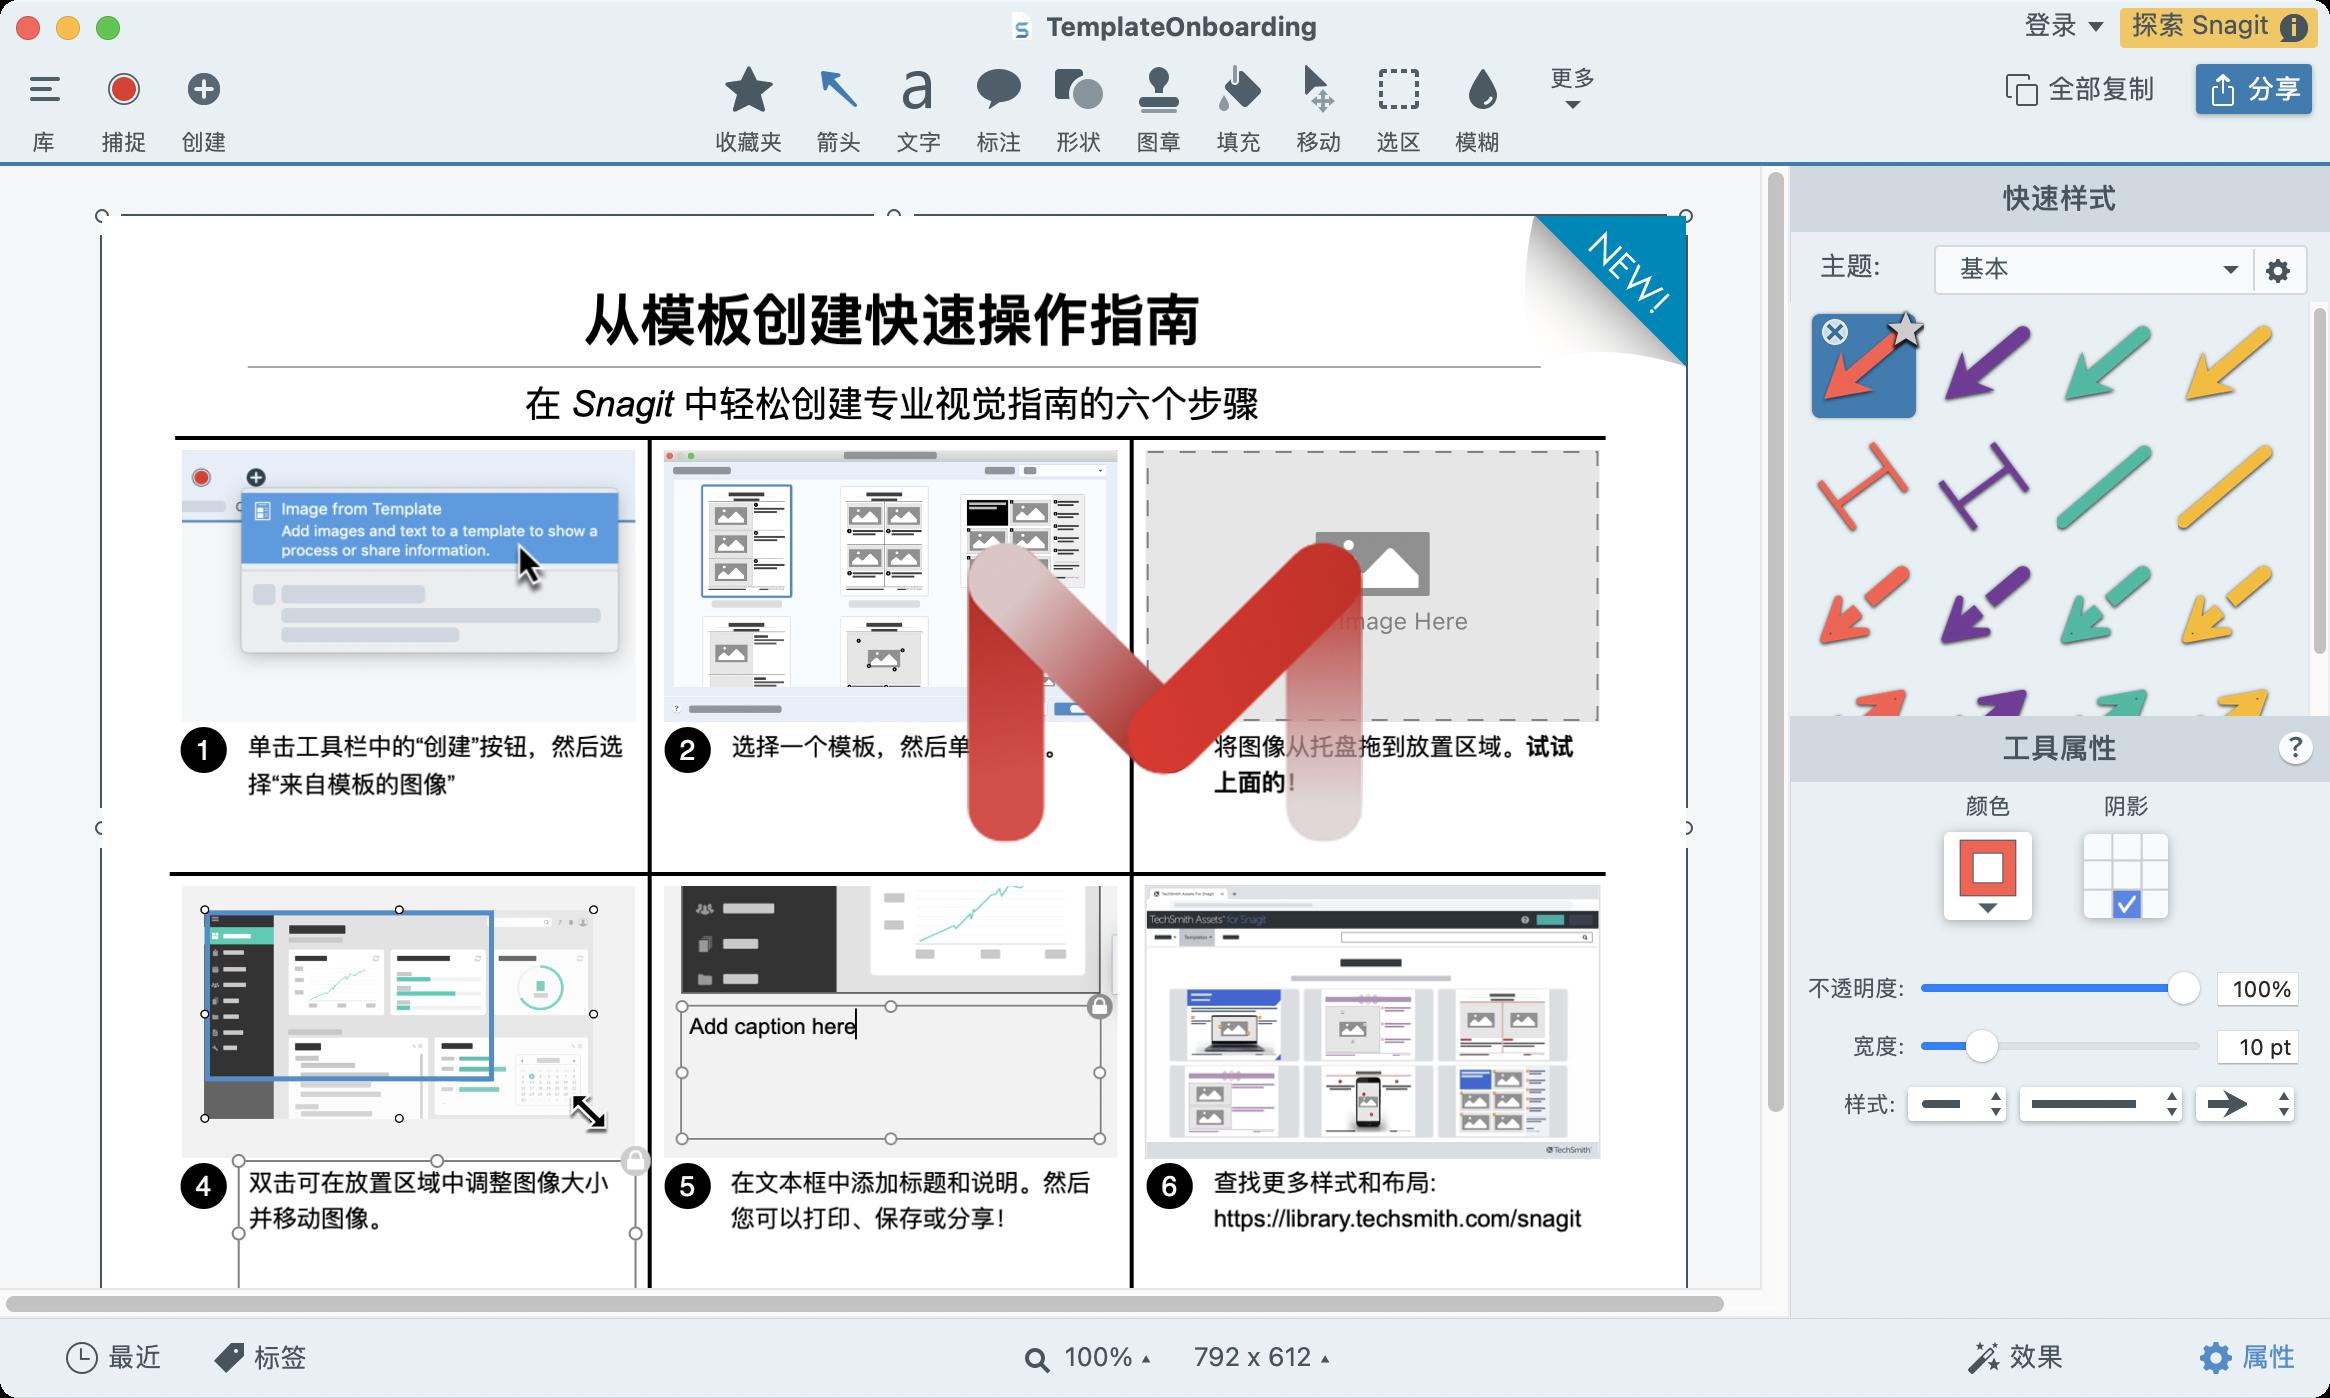 Snagit 2021 For Mac v2021.3.0 屏幕捕捉软件中文破解版